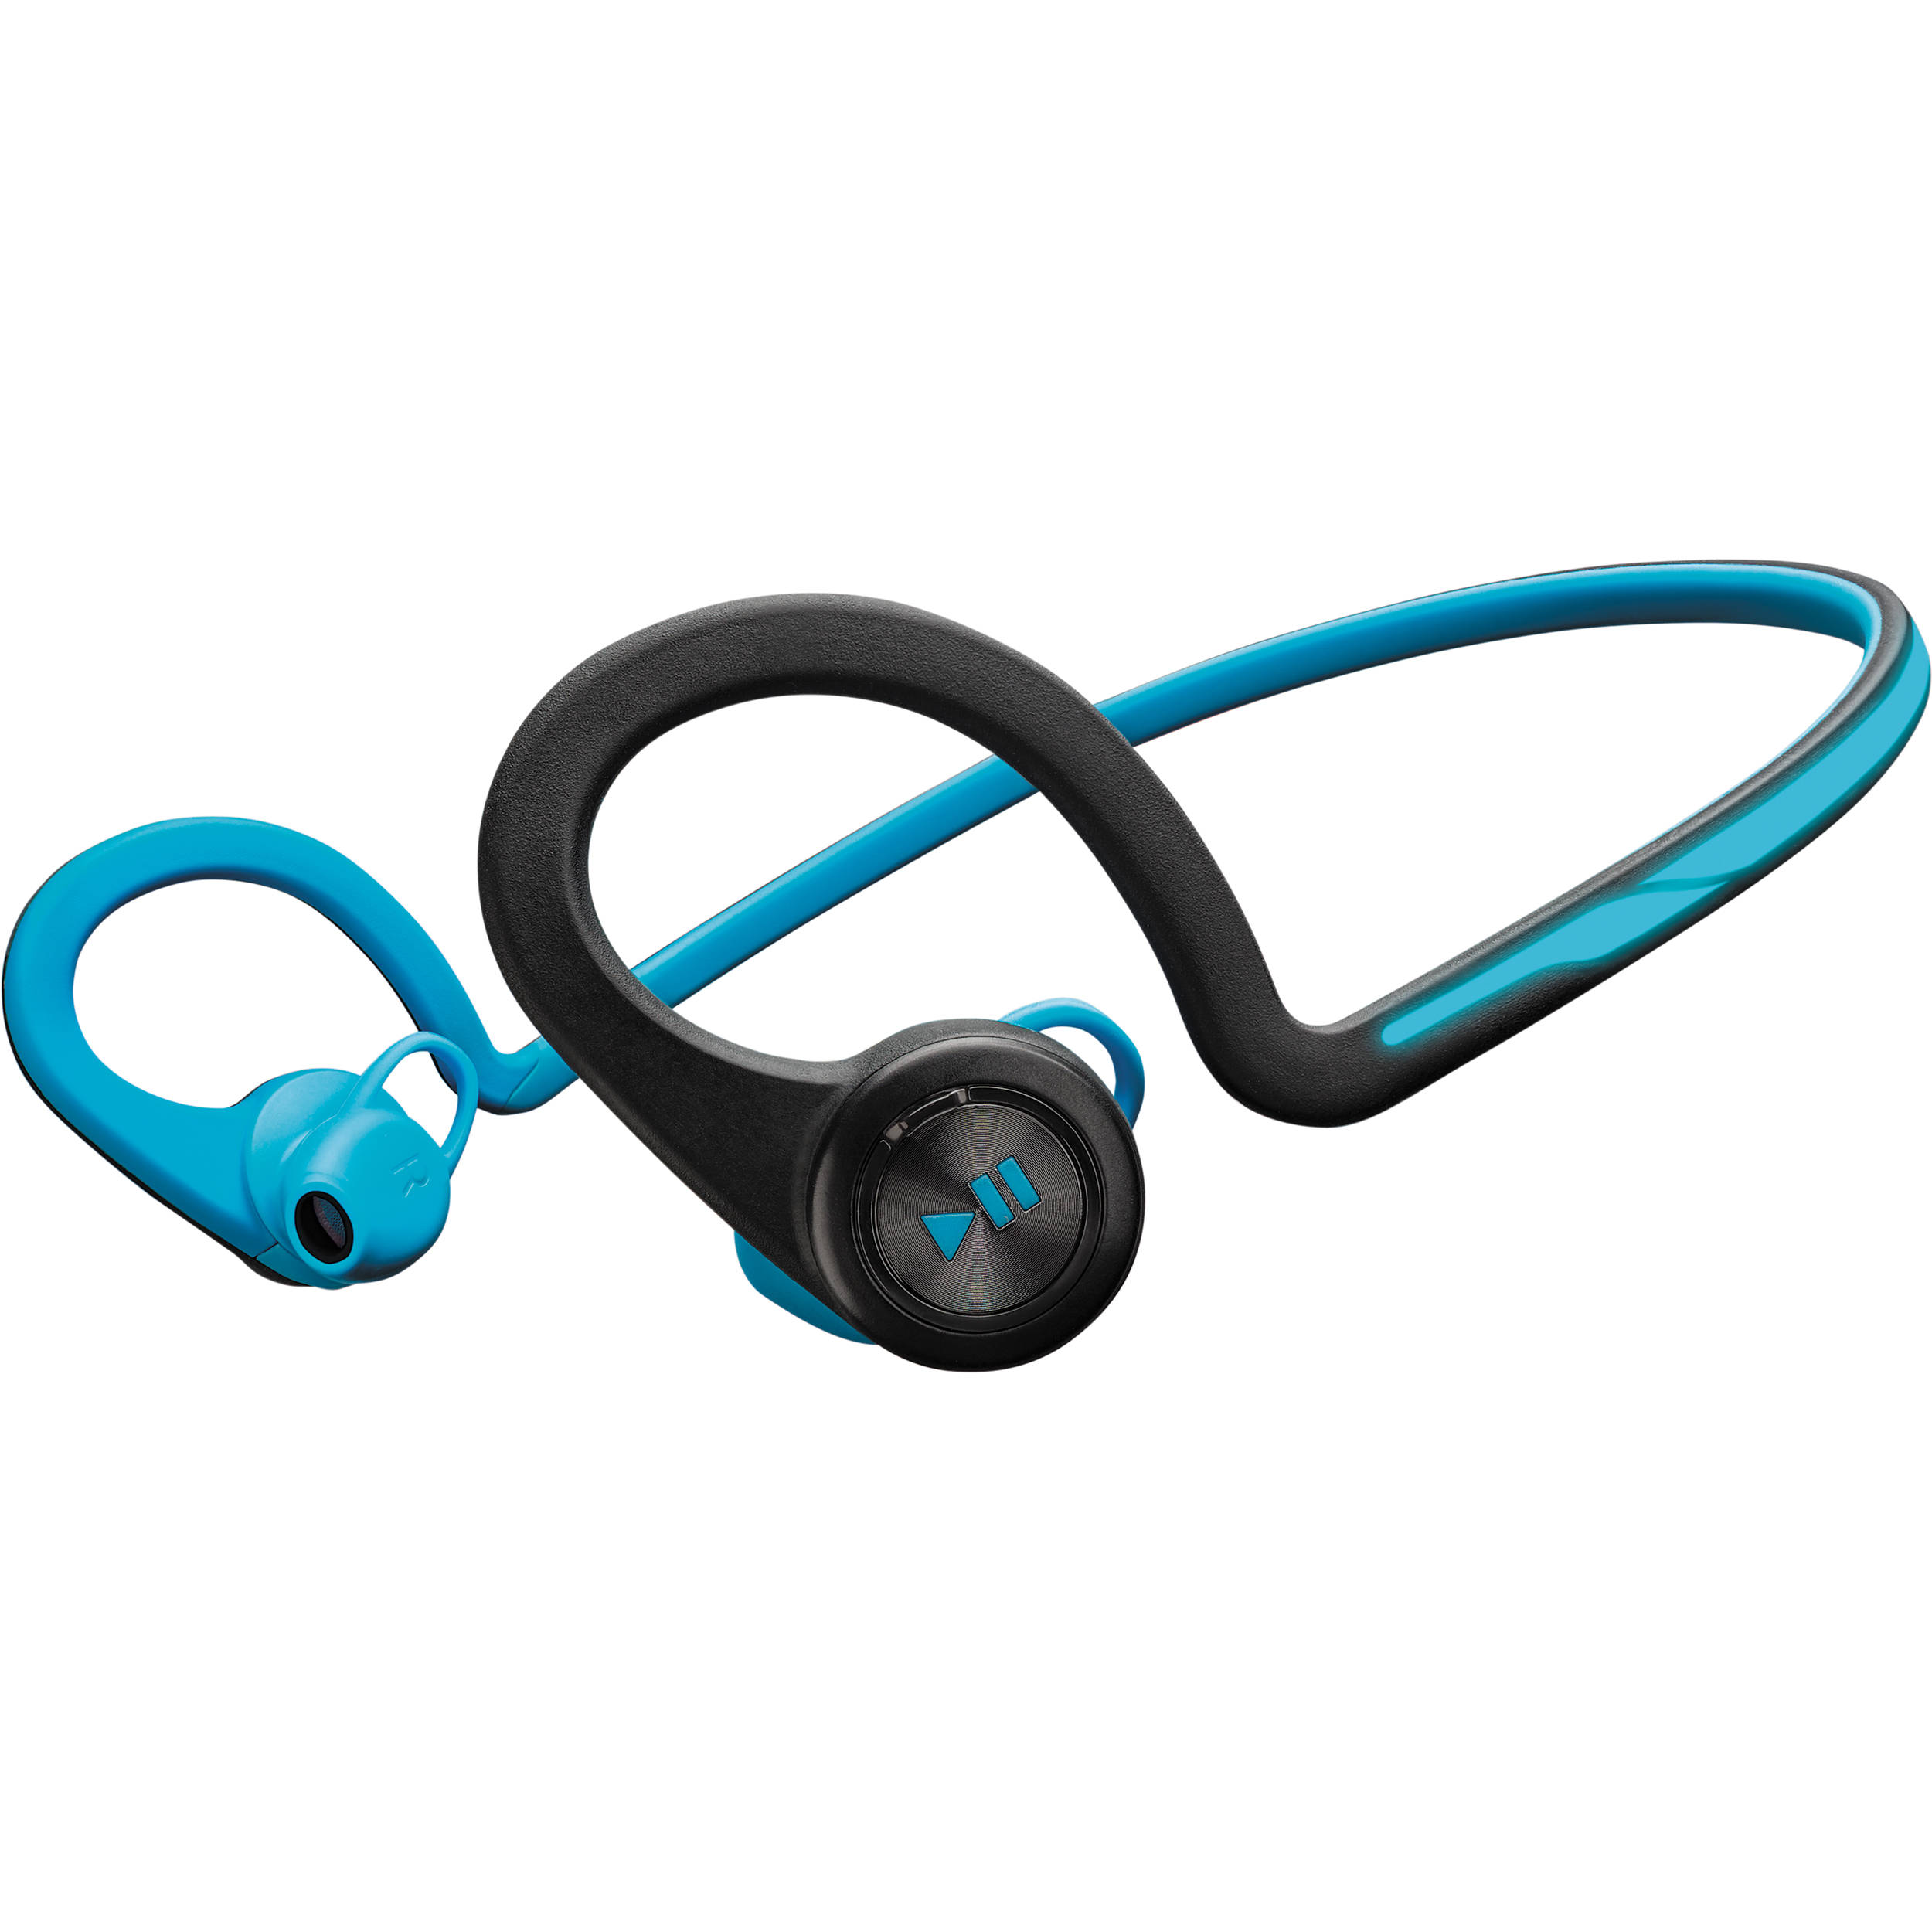 Plantronics BackBeat FIT Wireless Headphones with Mic (Blue)